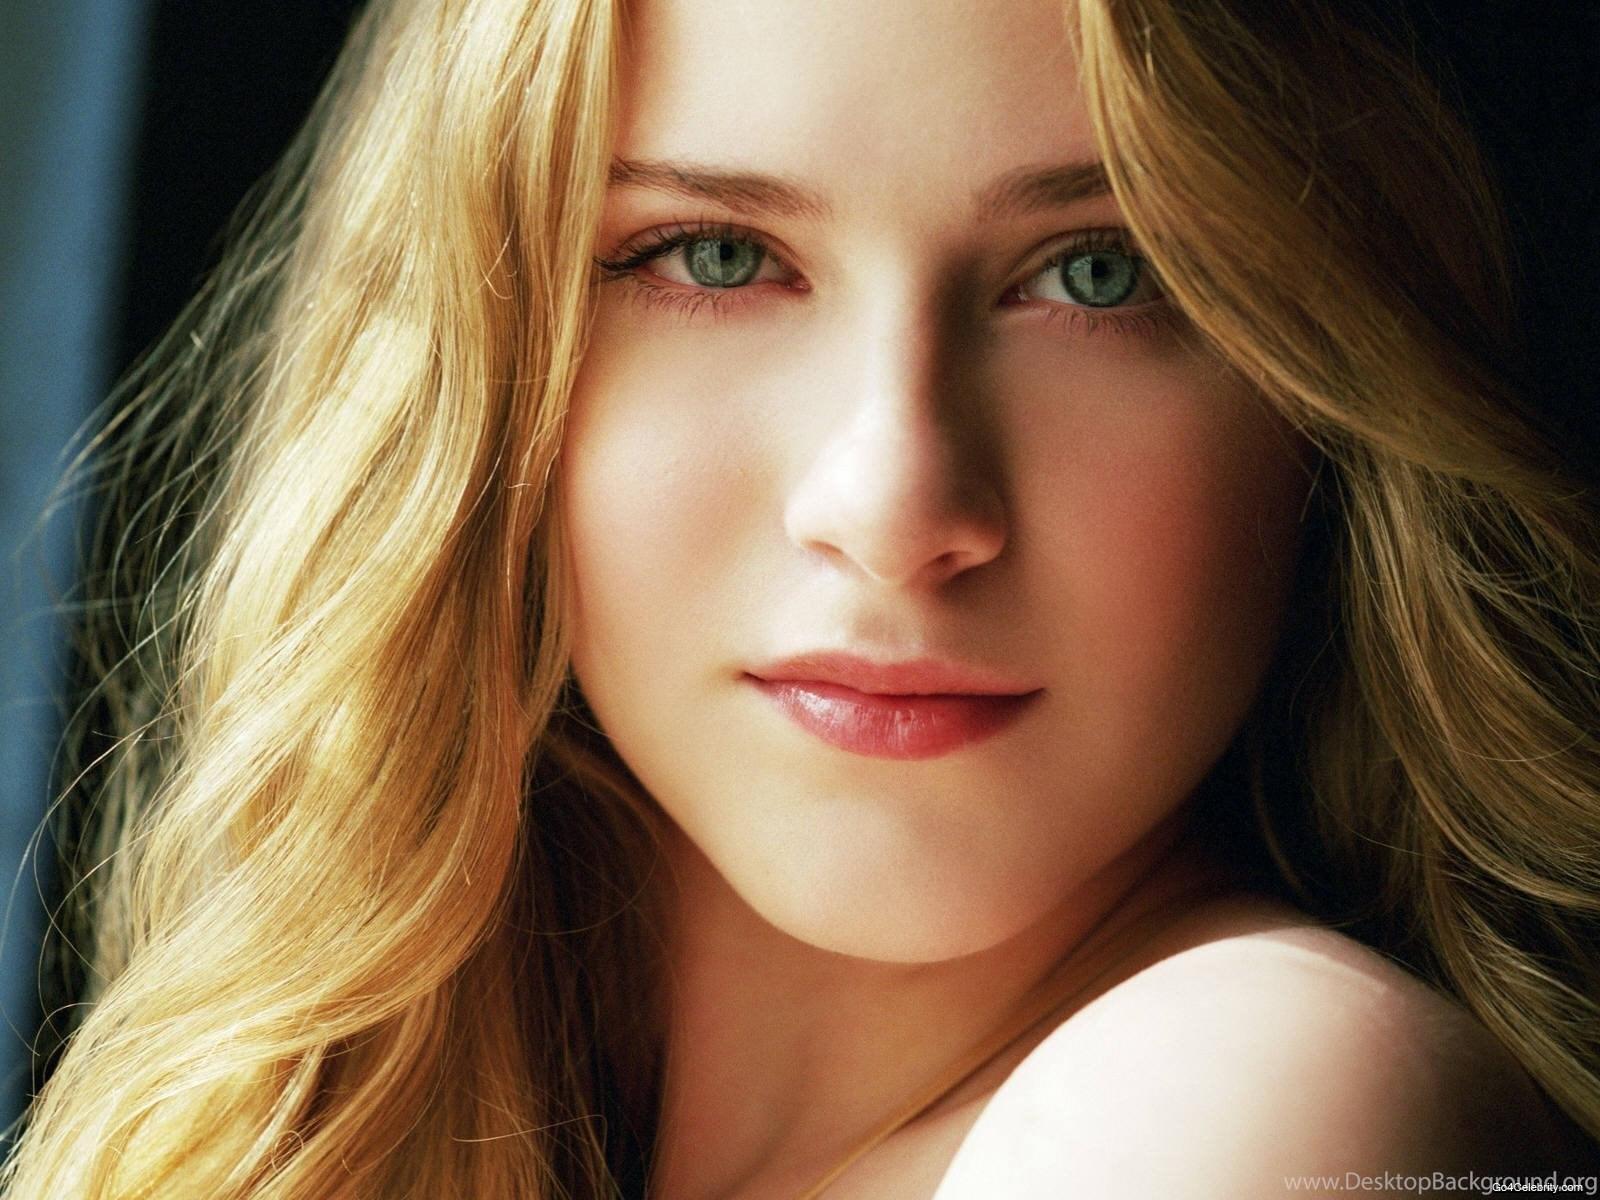 Wallpapers Blonde Worlds Beautiful Girls Hd In Otife 1600x1200